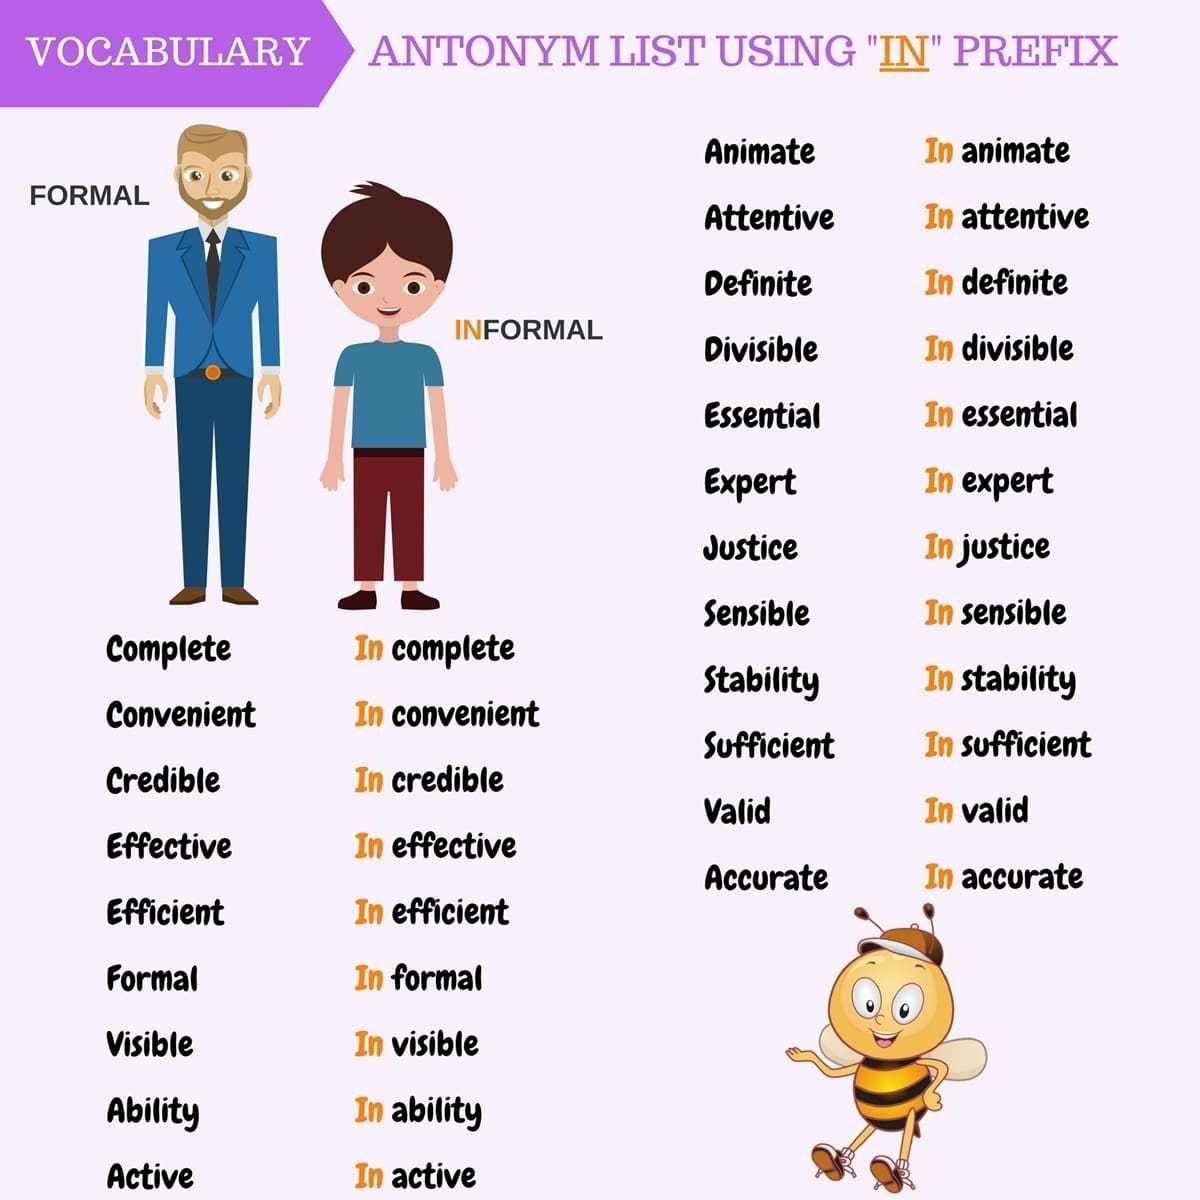 Antonym List Using In Prefix